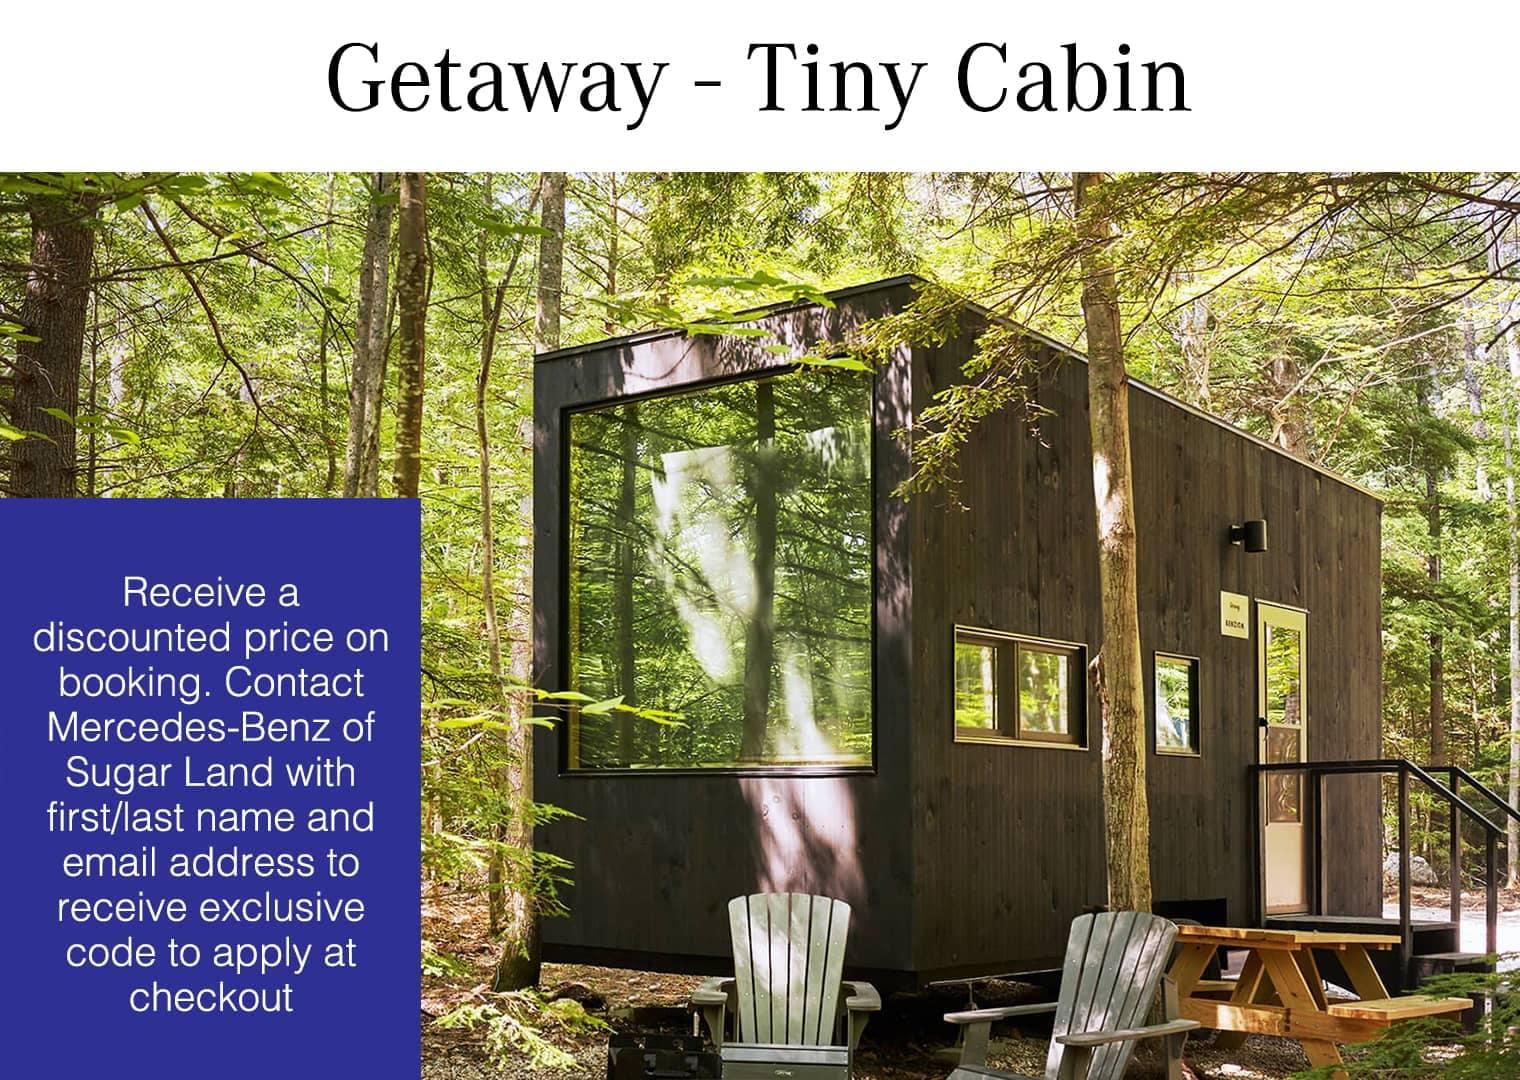 Getaway Tiny Cabin Slide